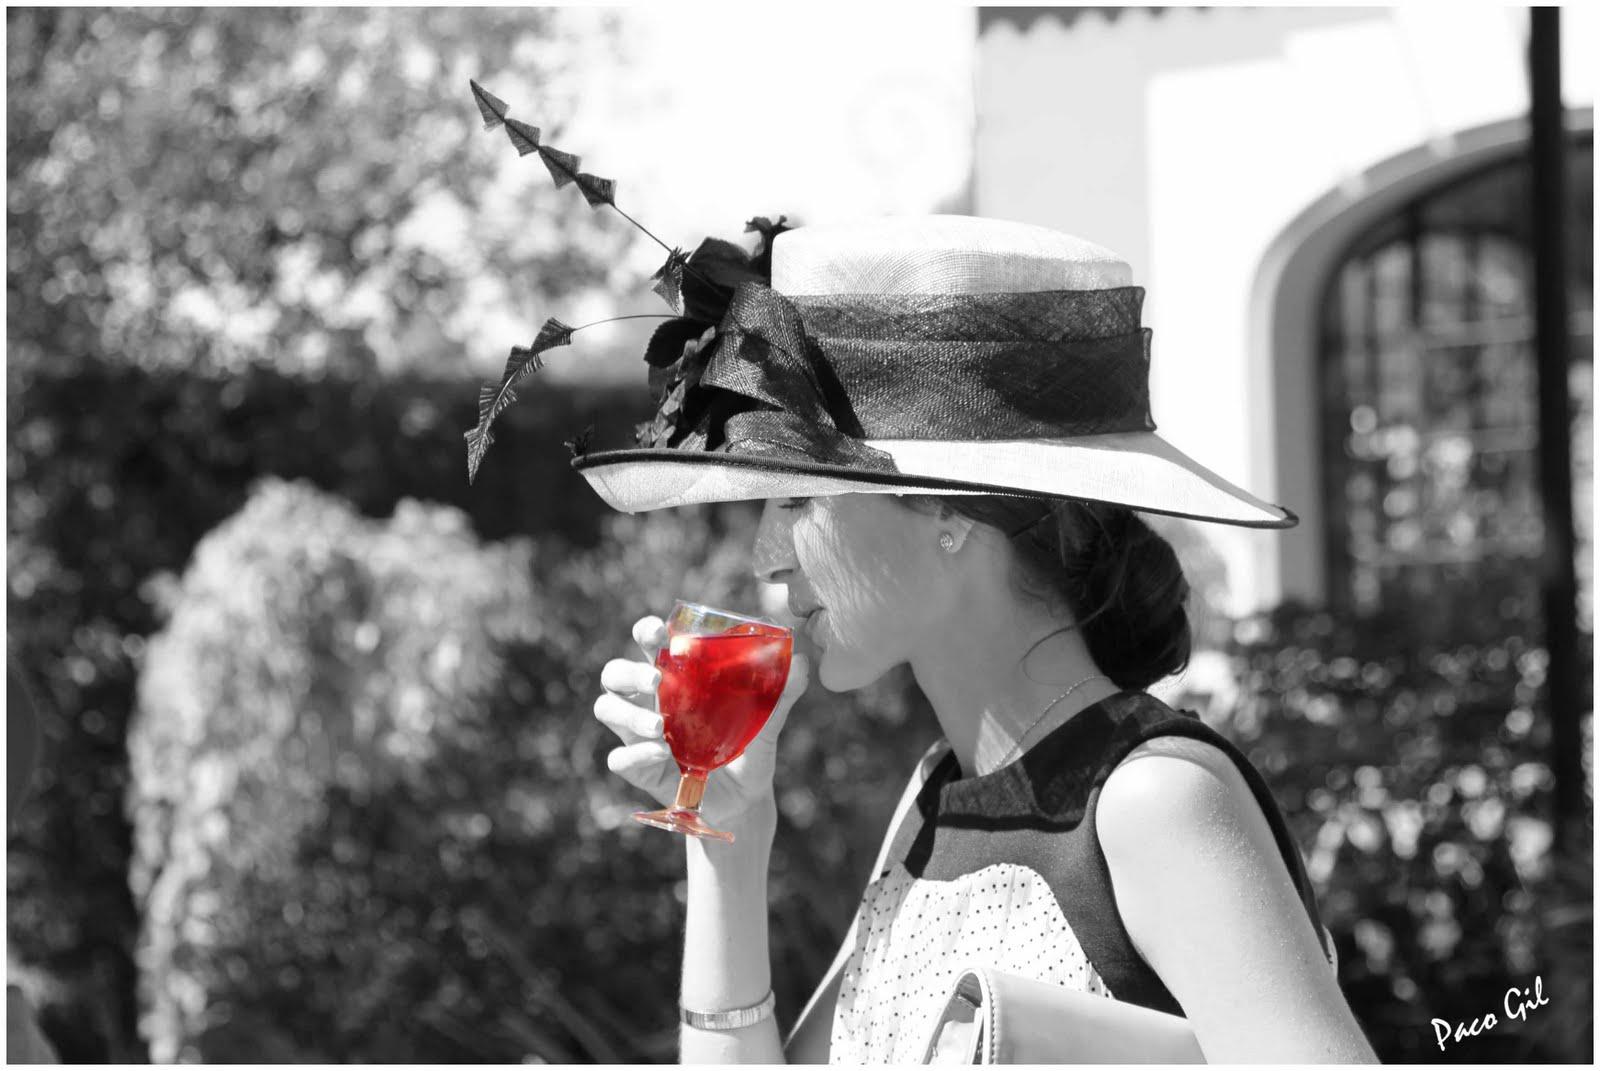 Fotografias paco gil blanco negro y rojo - Blanco y negro paint ...